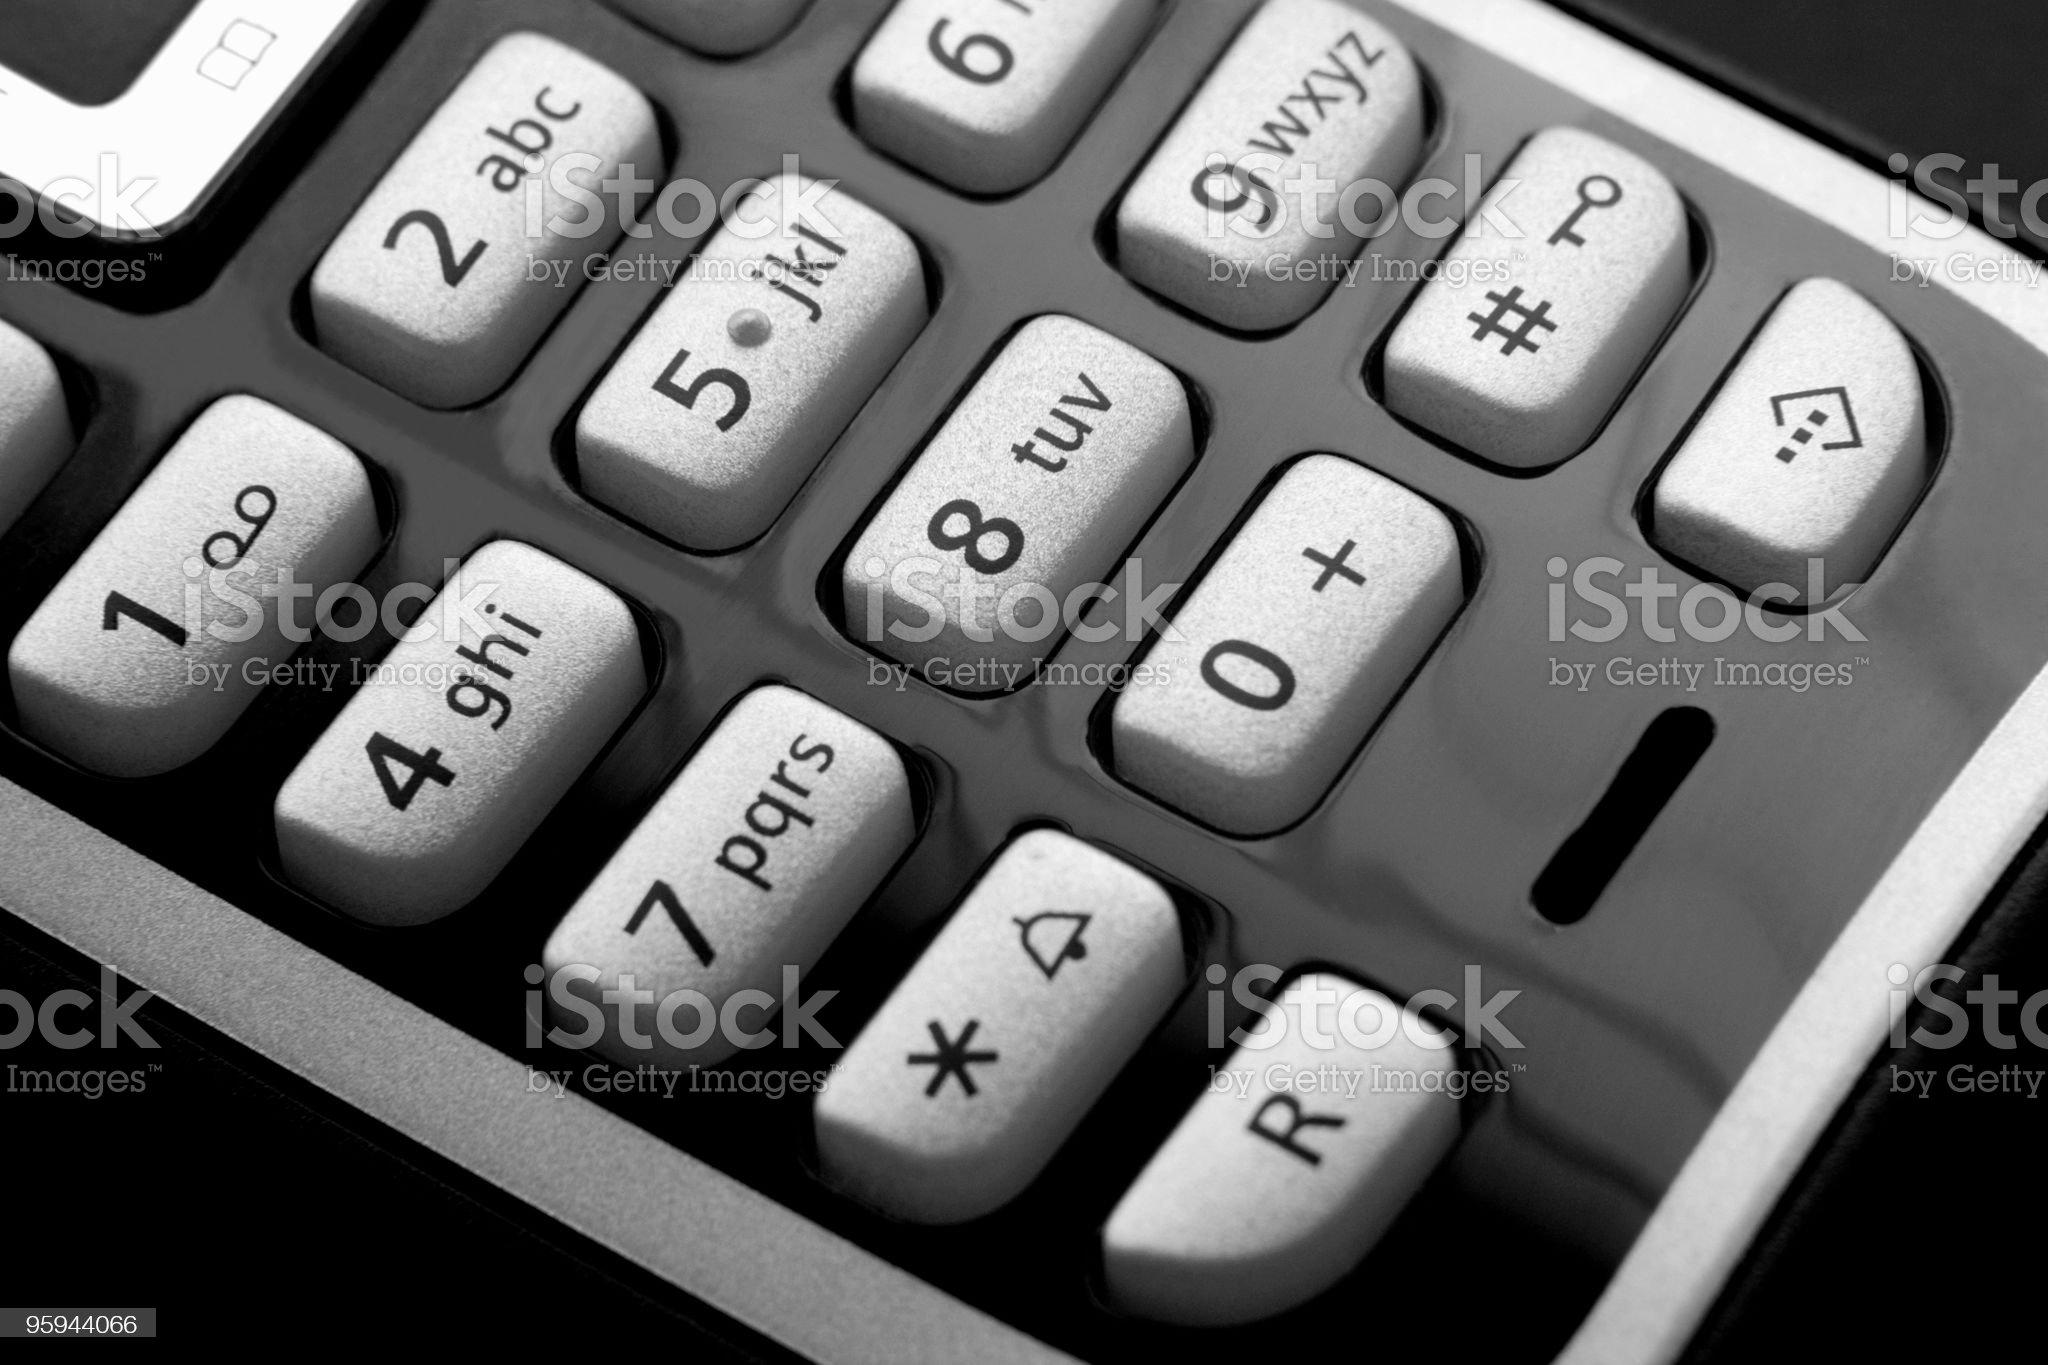 black mobile phone detail royalty-free stock photo